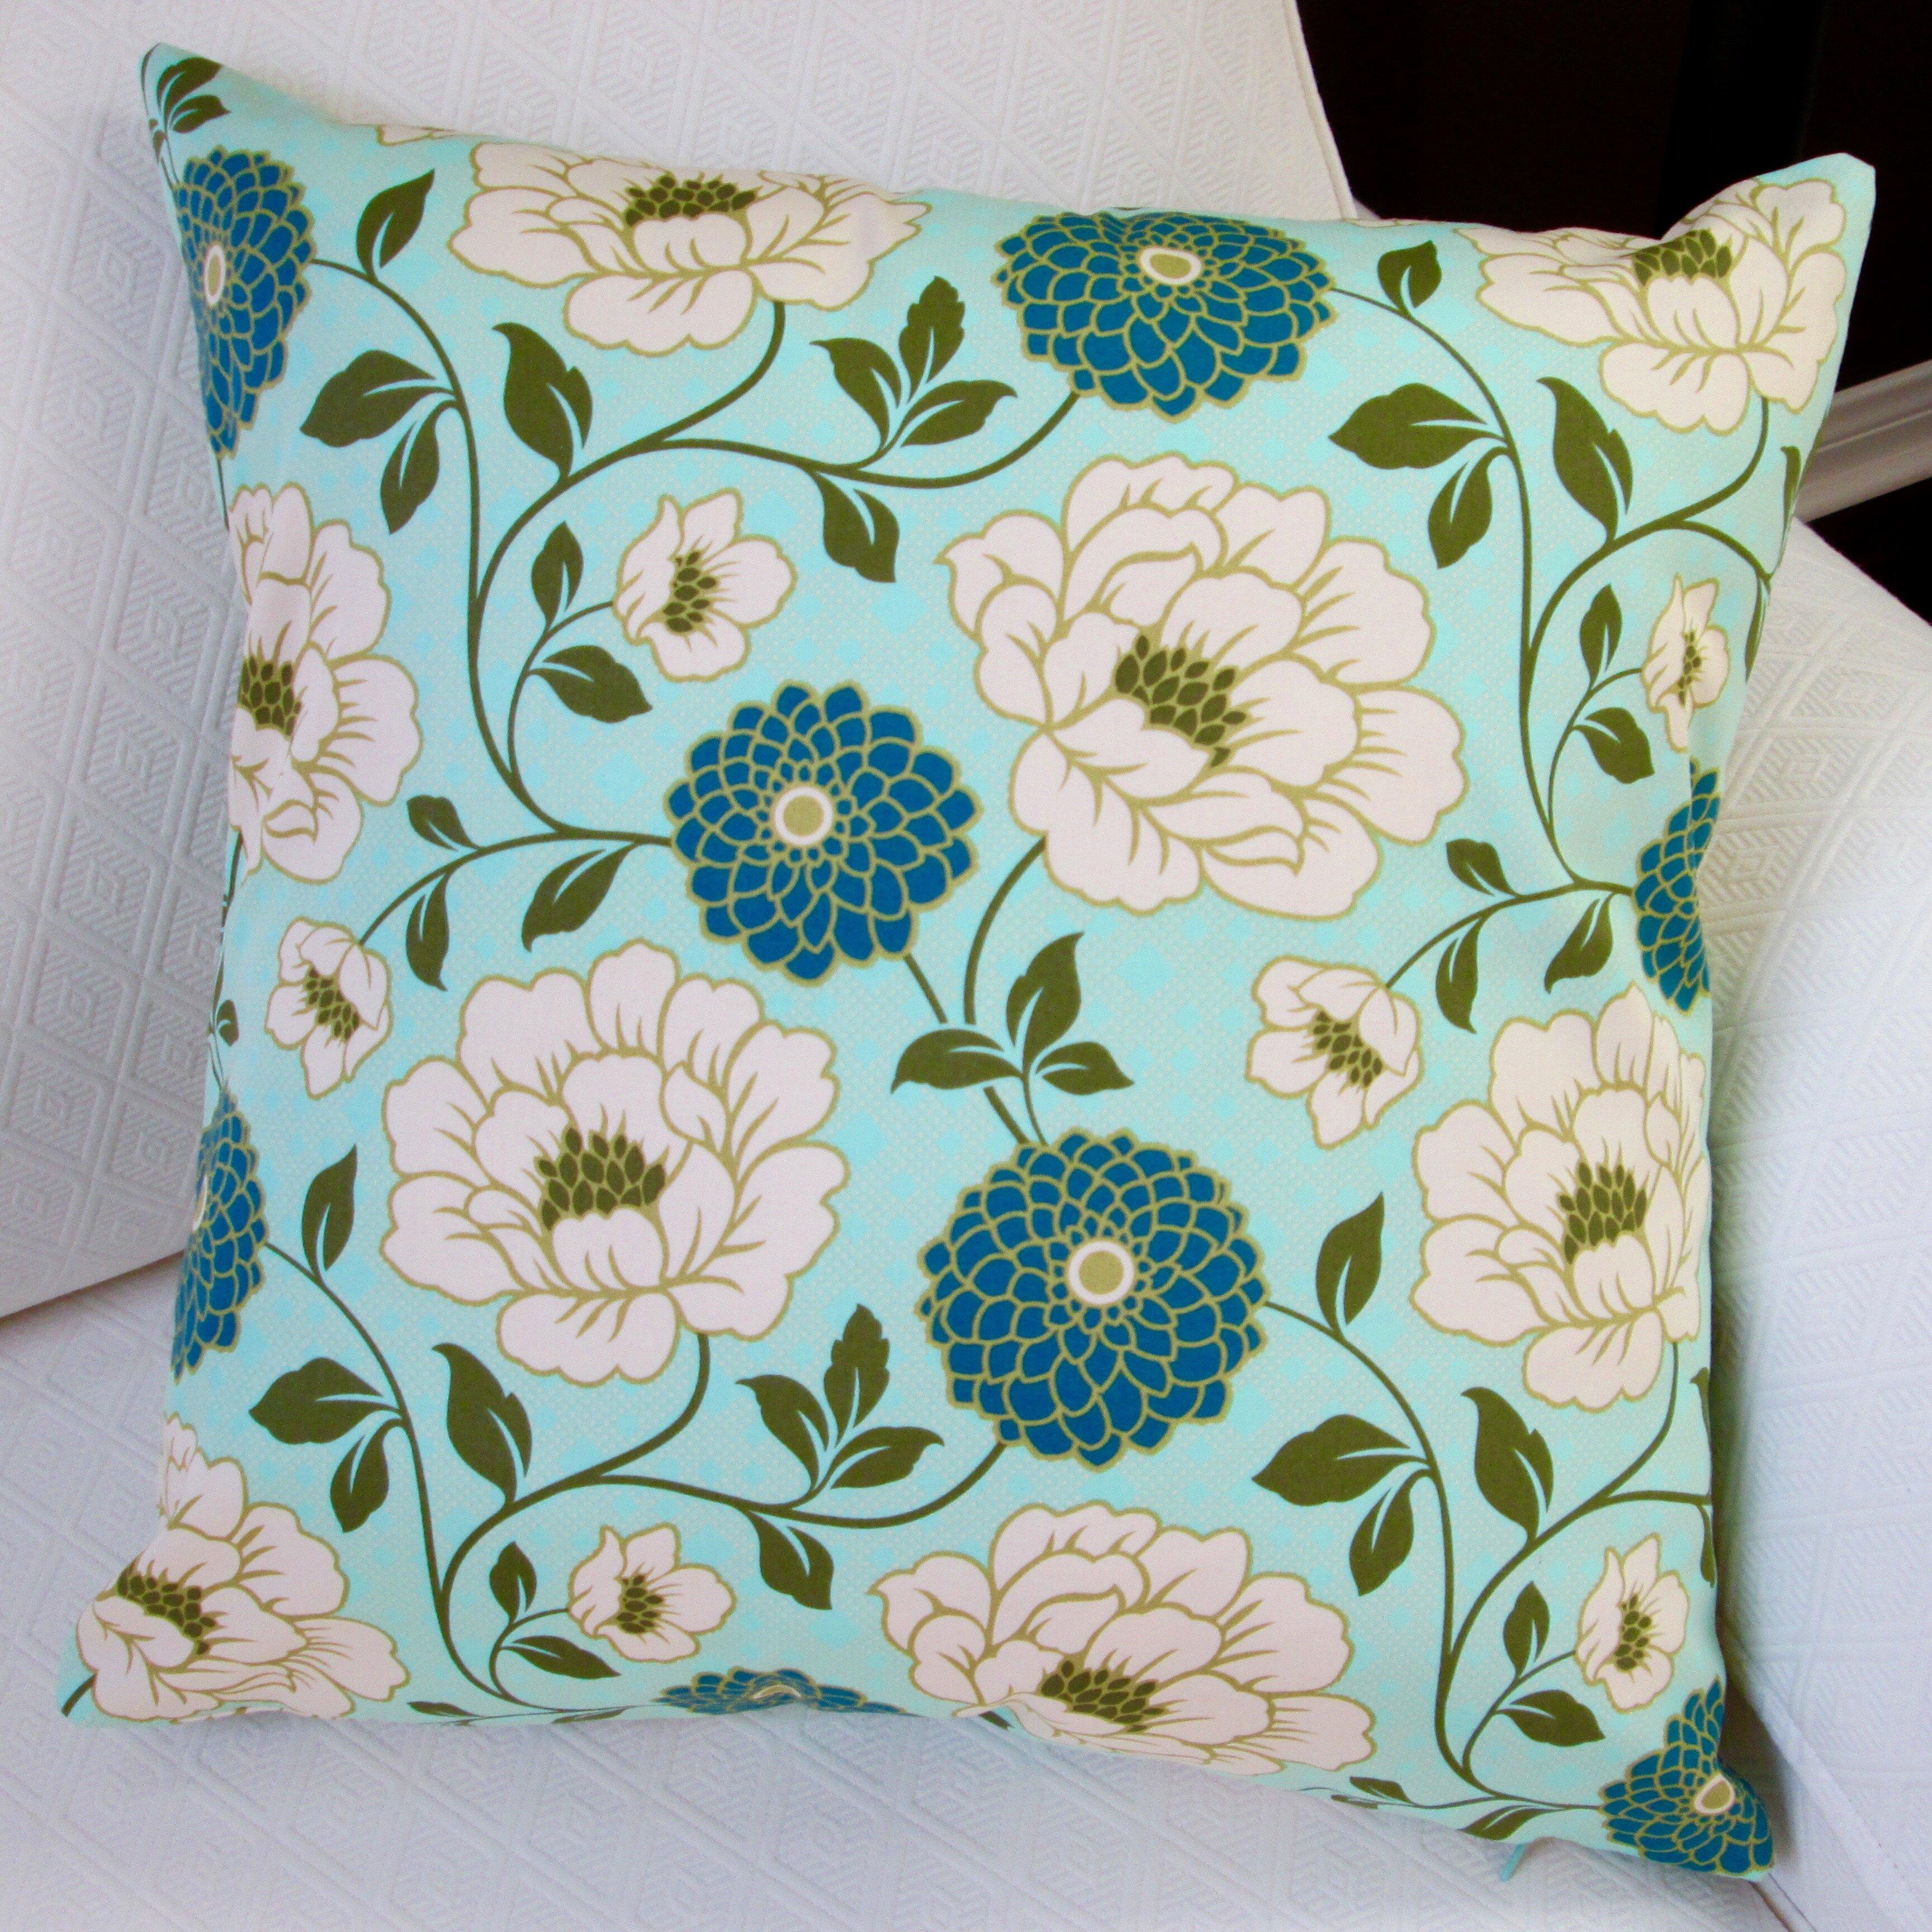 Wayfair Modern Pillow : Artisan Pillows Bungalow Dahlia Flowers Modern Indoor Cotton Throw Pillow Wayfair